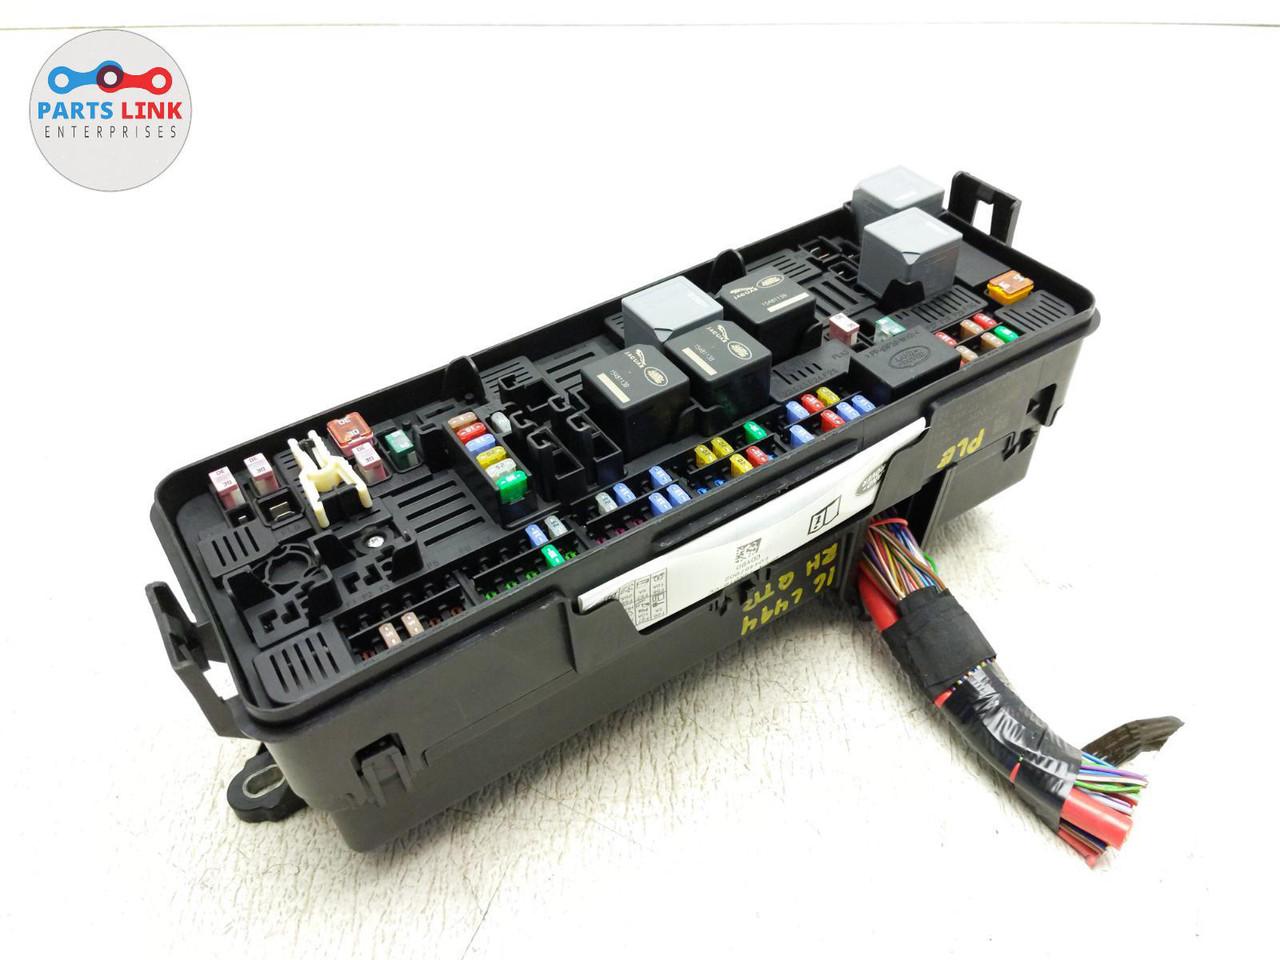 16-17 range rover sport diesel rear right quarter fuse box power relay  assembly  parts link enterprise